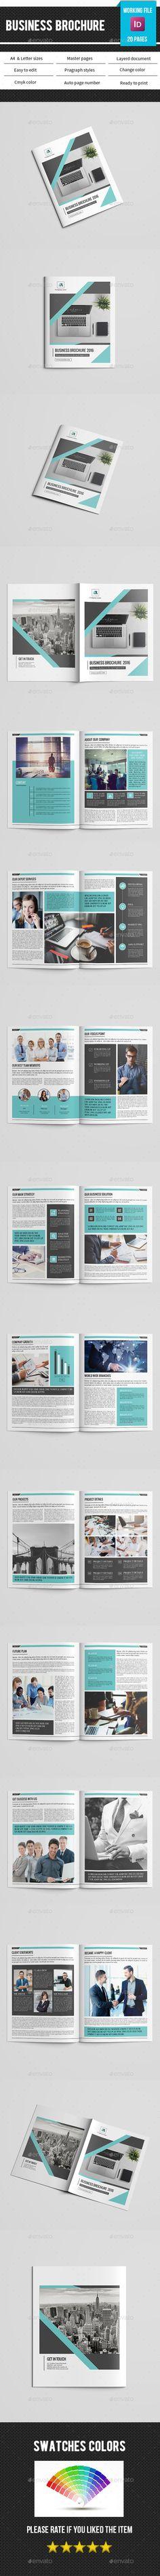 Business Brochure Template-V404 - Corporate Brochures